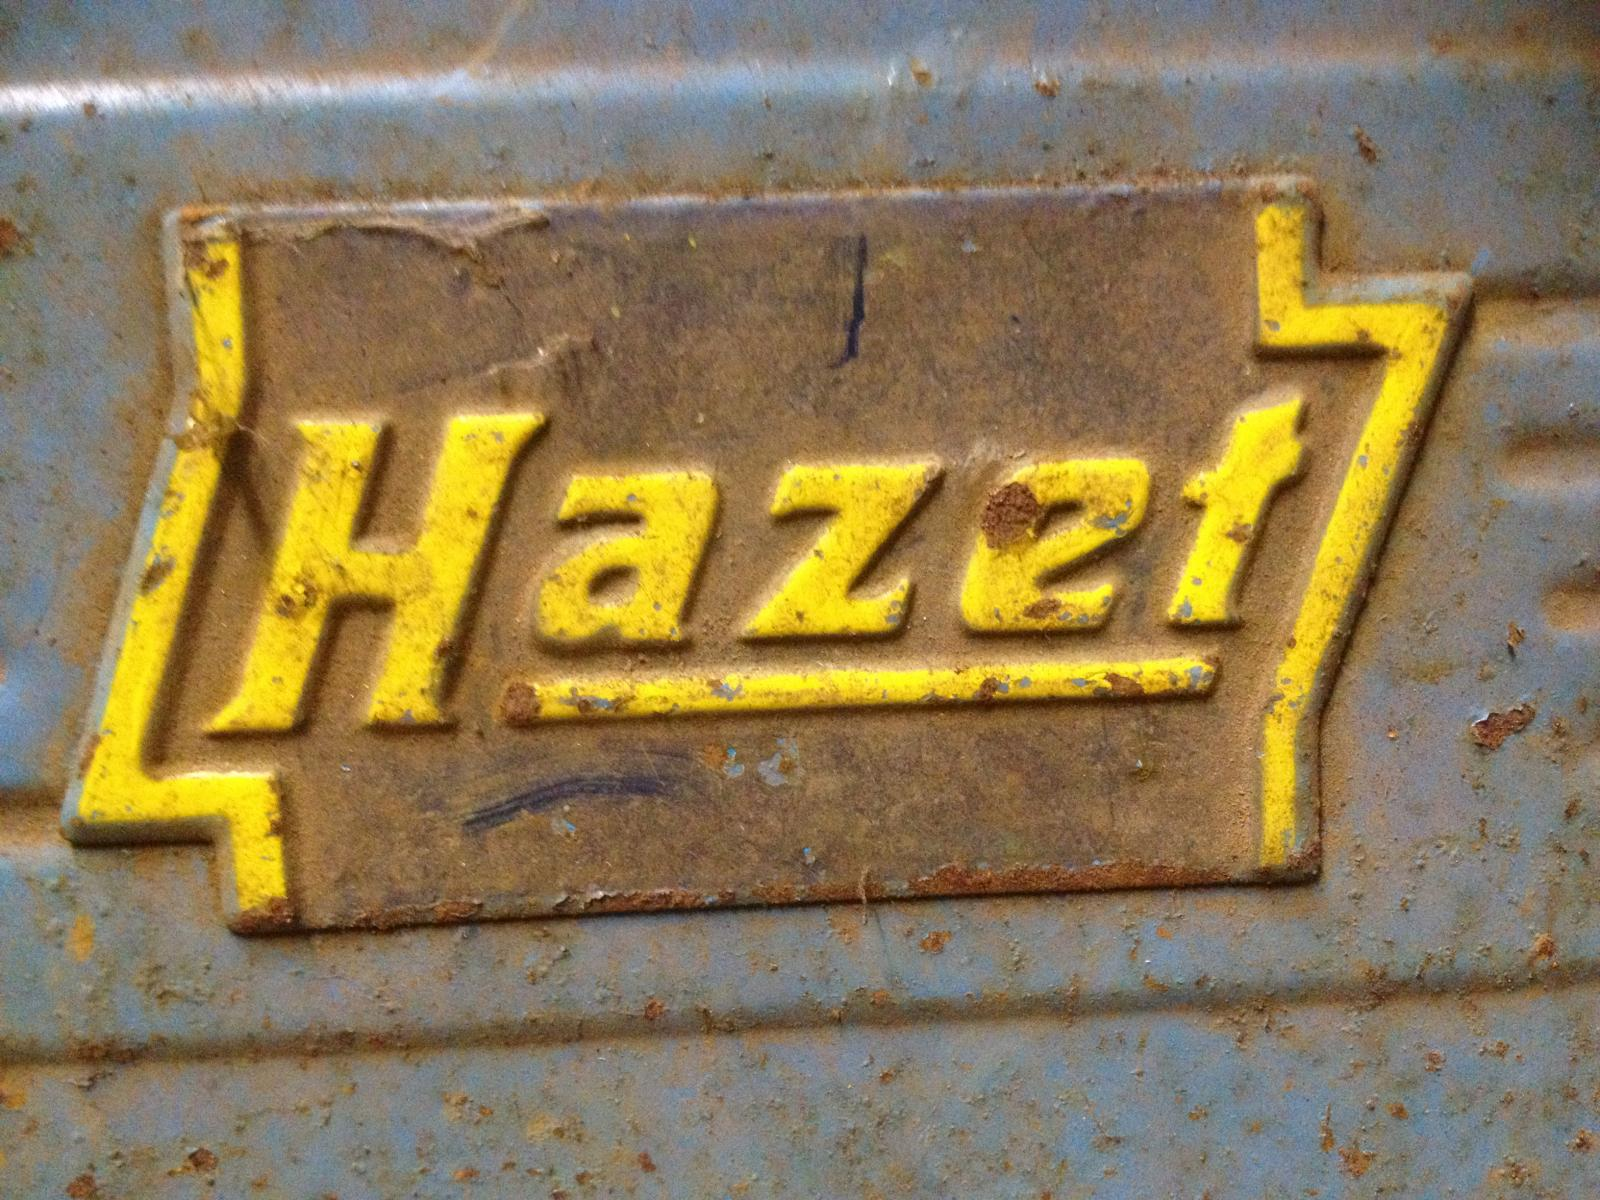 Small a Hazet Tool Box